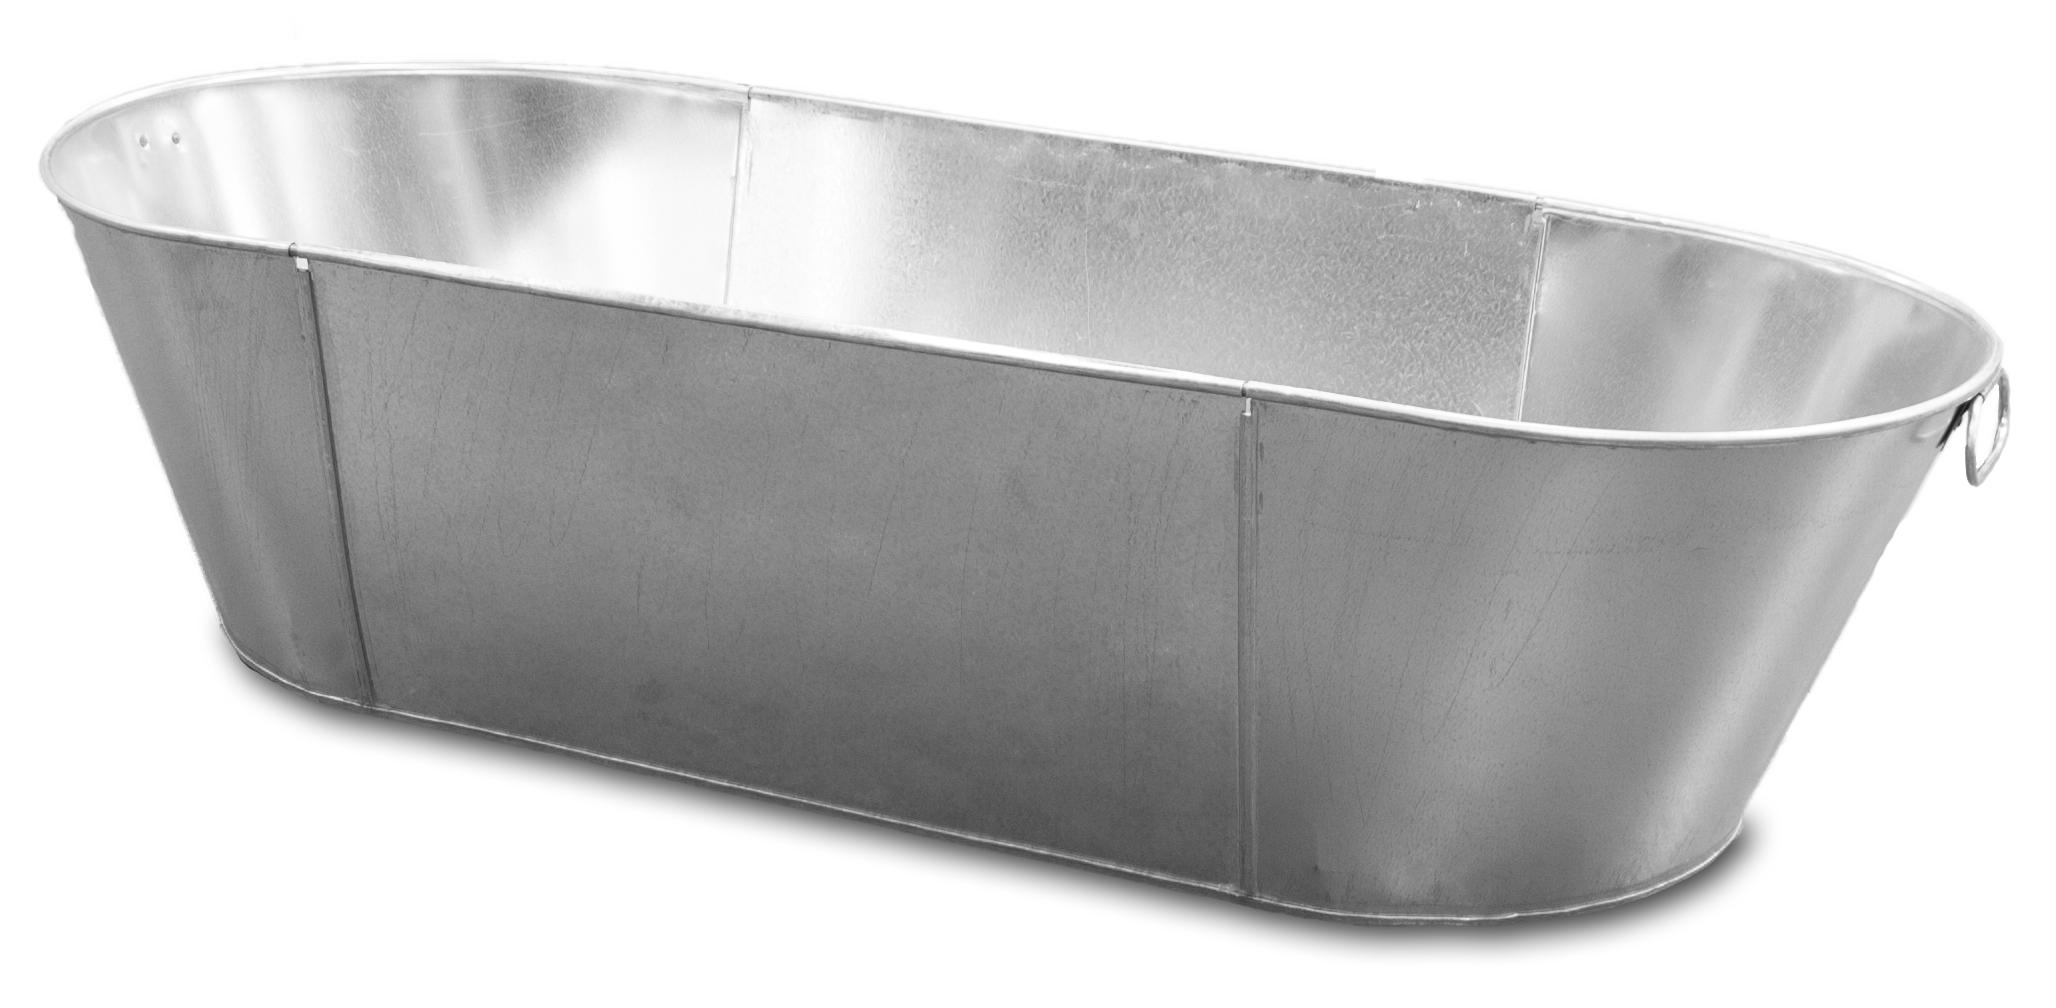 Tin Bath - Galvanised Steel Bath - Handmade In England - Sherpa Tools